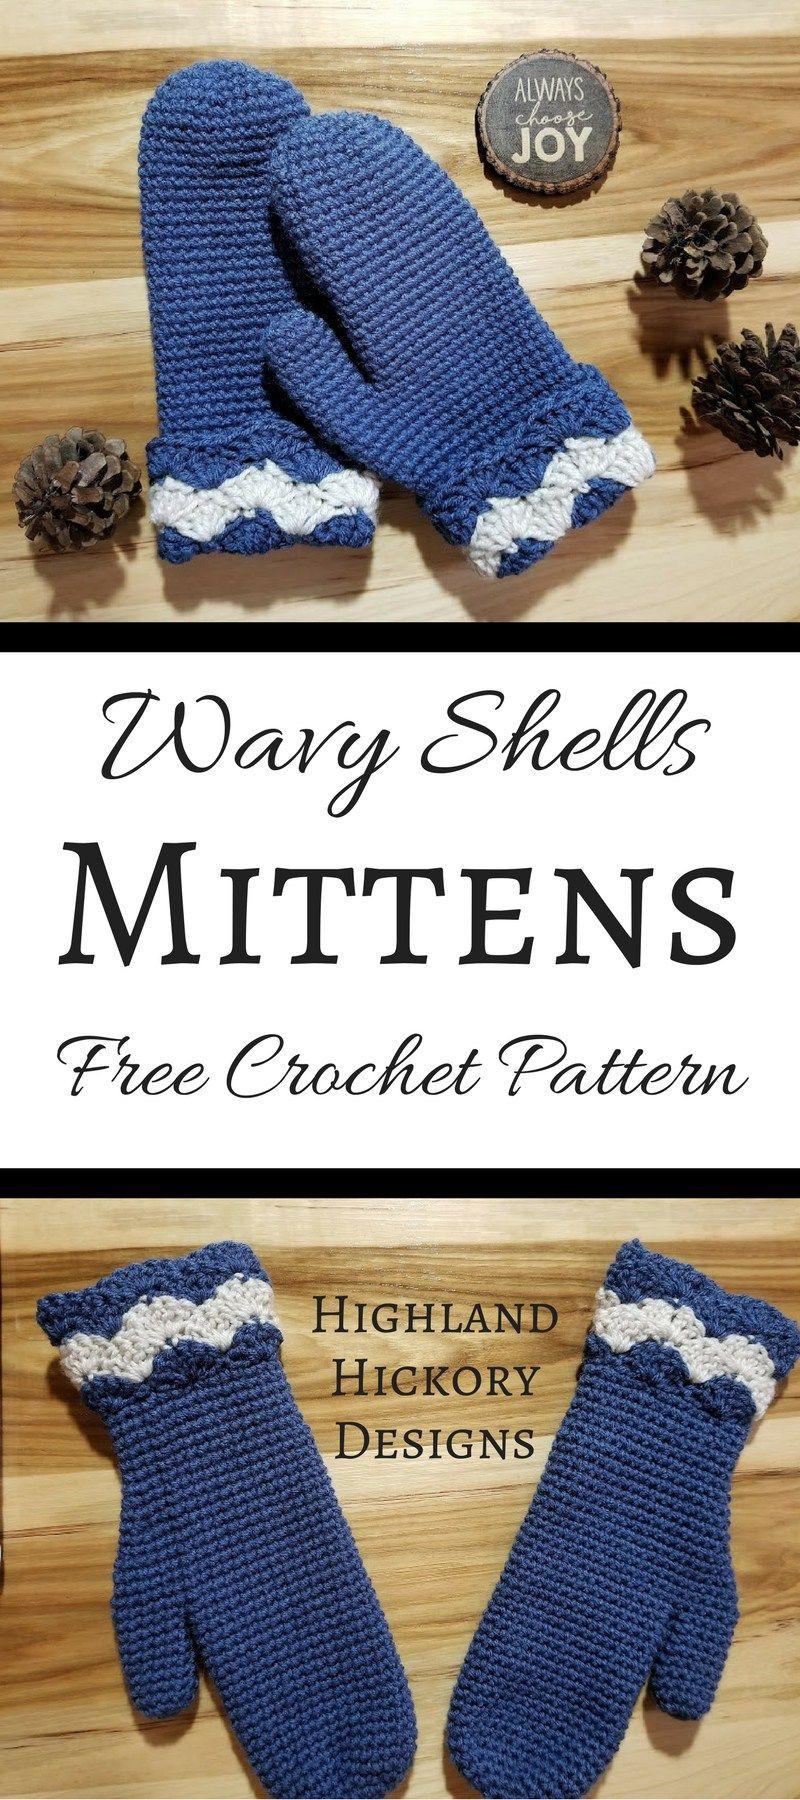 Wavy Shells Mittens | Colegios